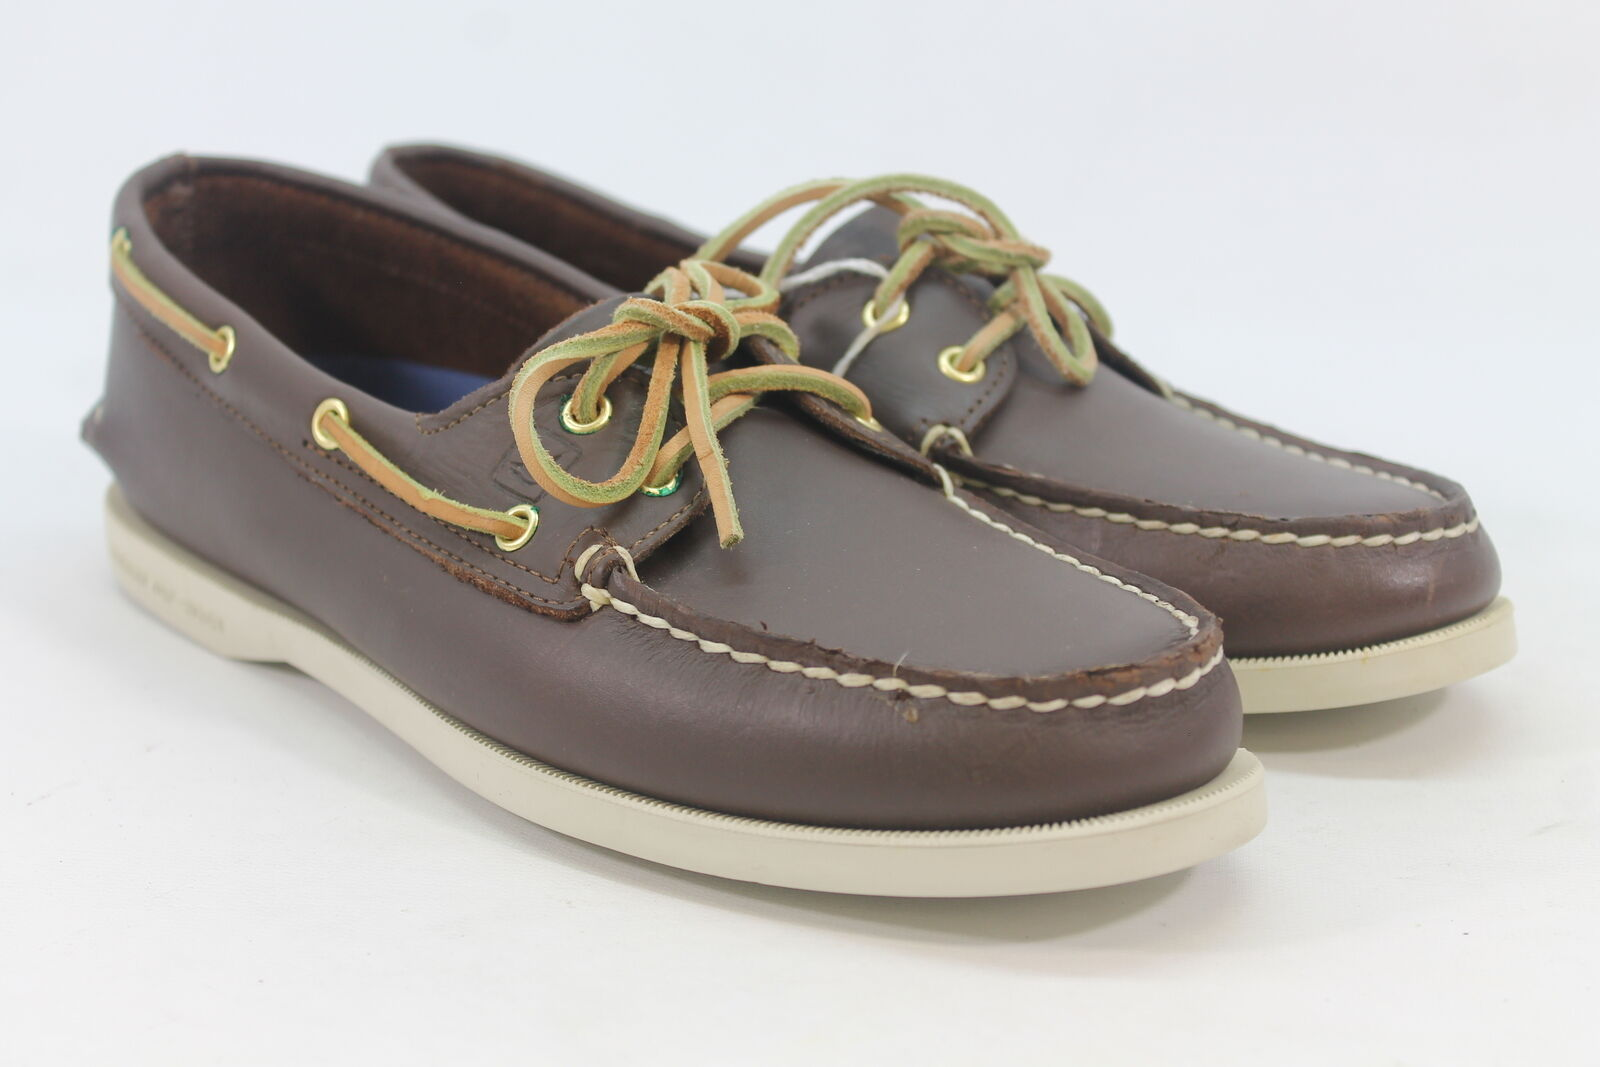 Sperry-Top Sider Authentic Original Women's Brown Boat Shoe 10M(ZAP12316)